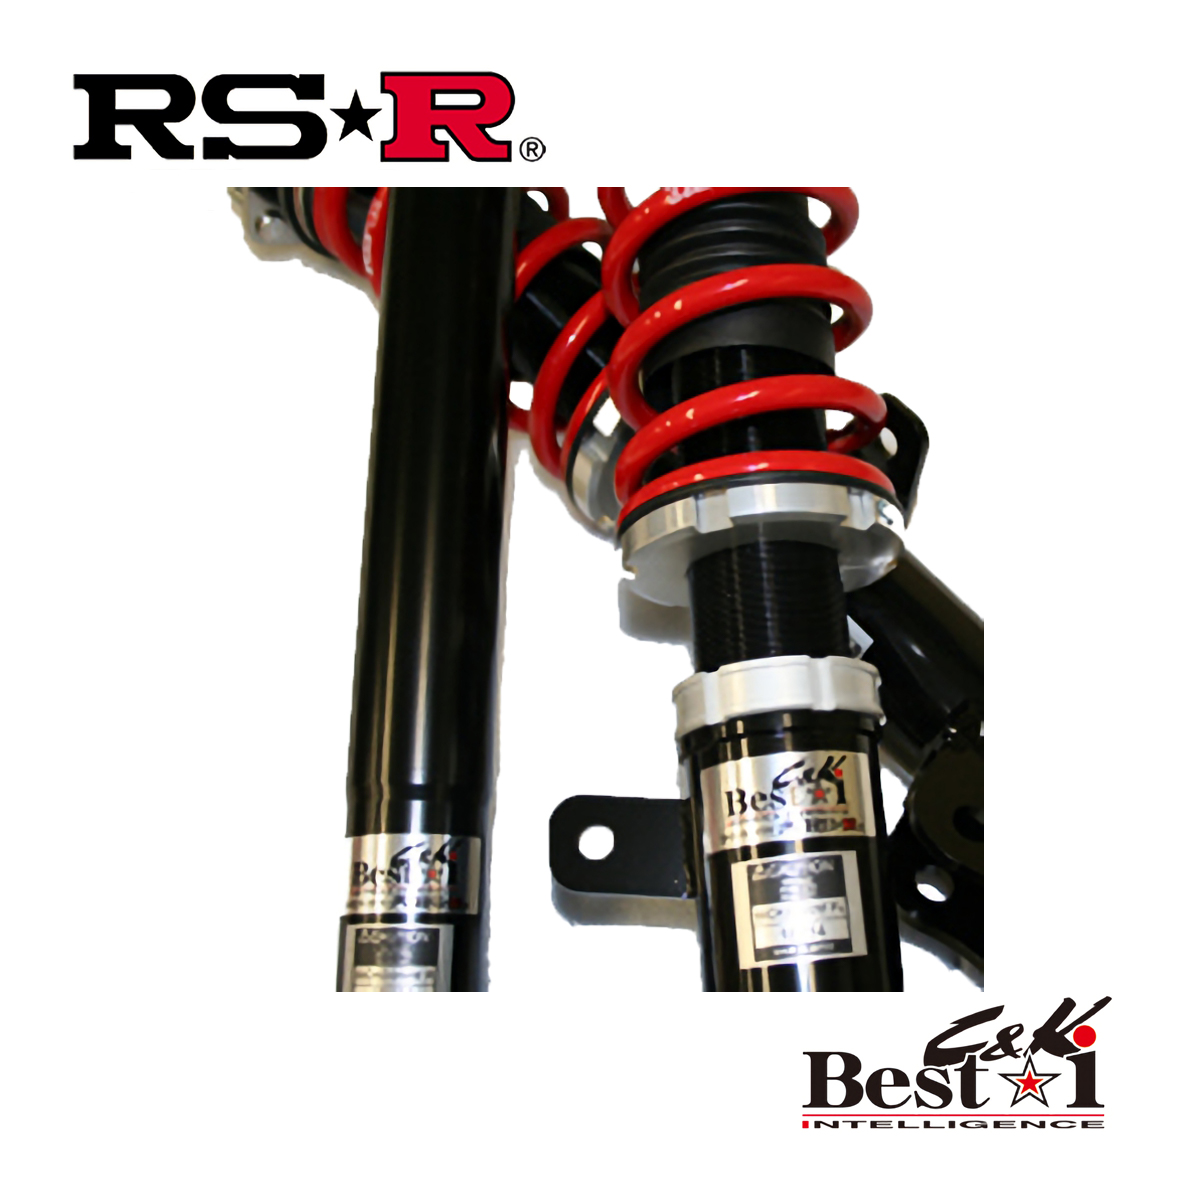 RS-R デイズ B44W ハイウェイスターX 車高調 リア車高調整: ネジ式 BICKN511M ベストi C&K RSR 個人宅発送追金有